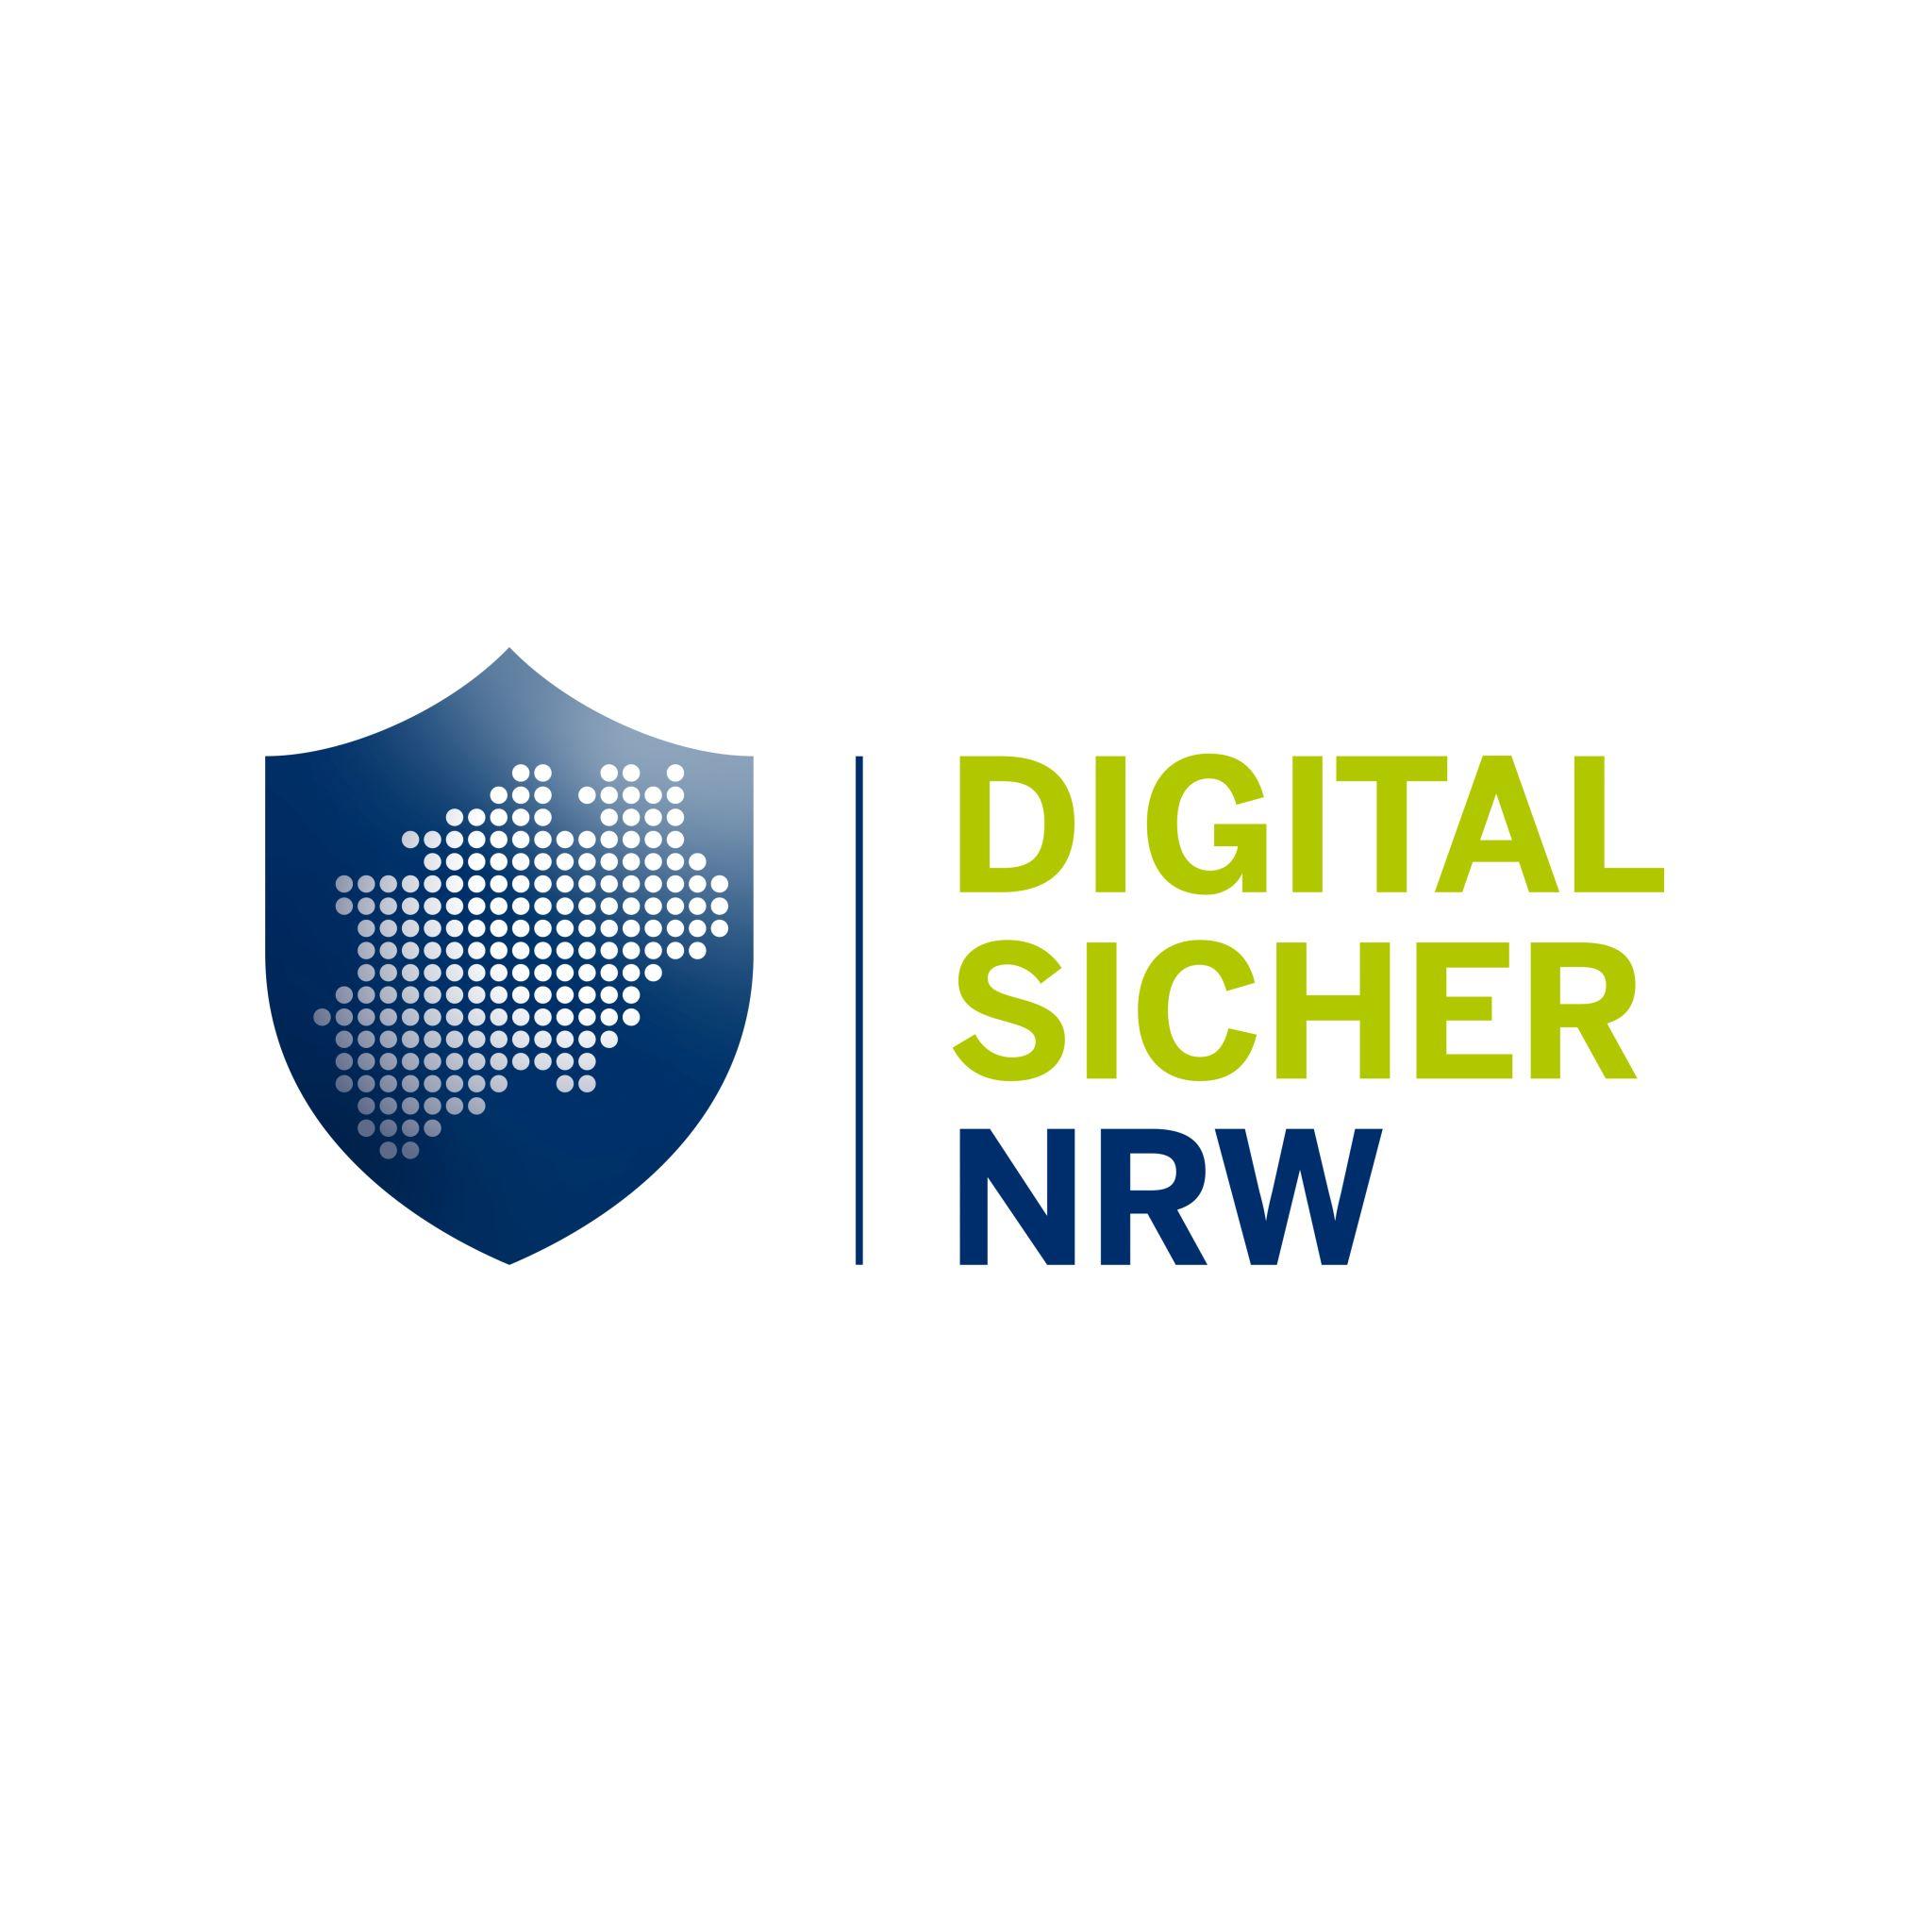 DIGITAL.SICHER.NRW